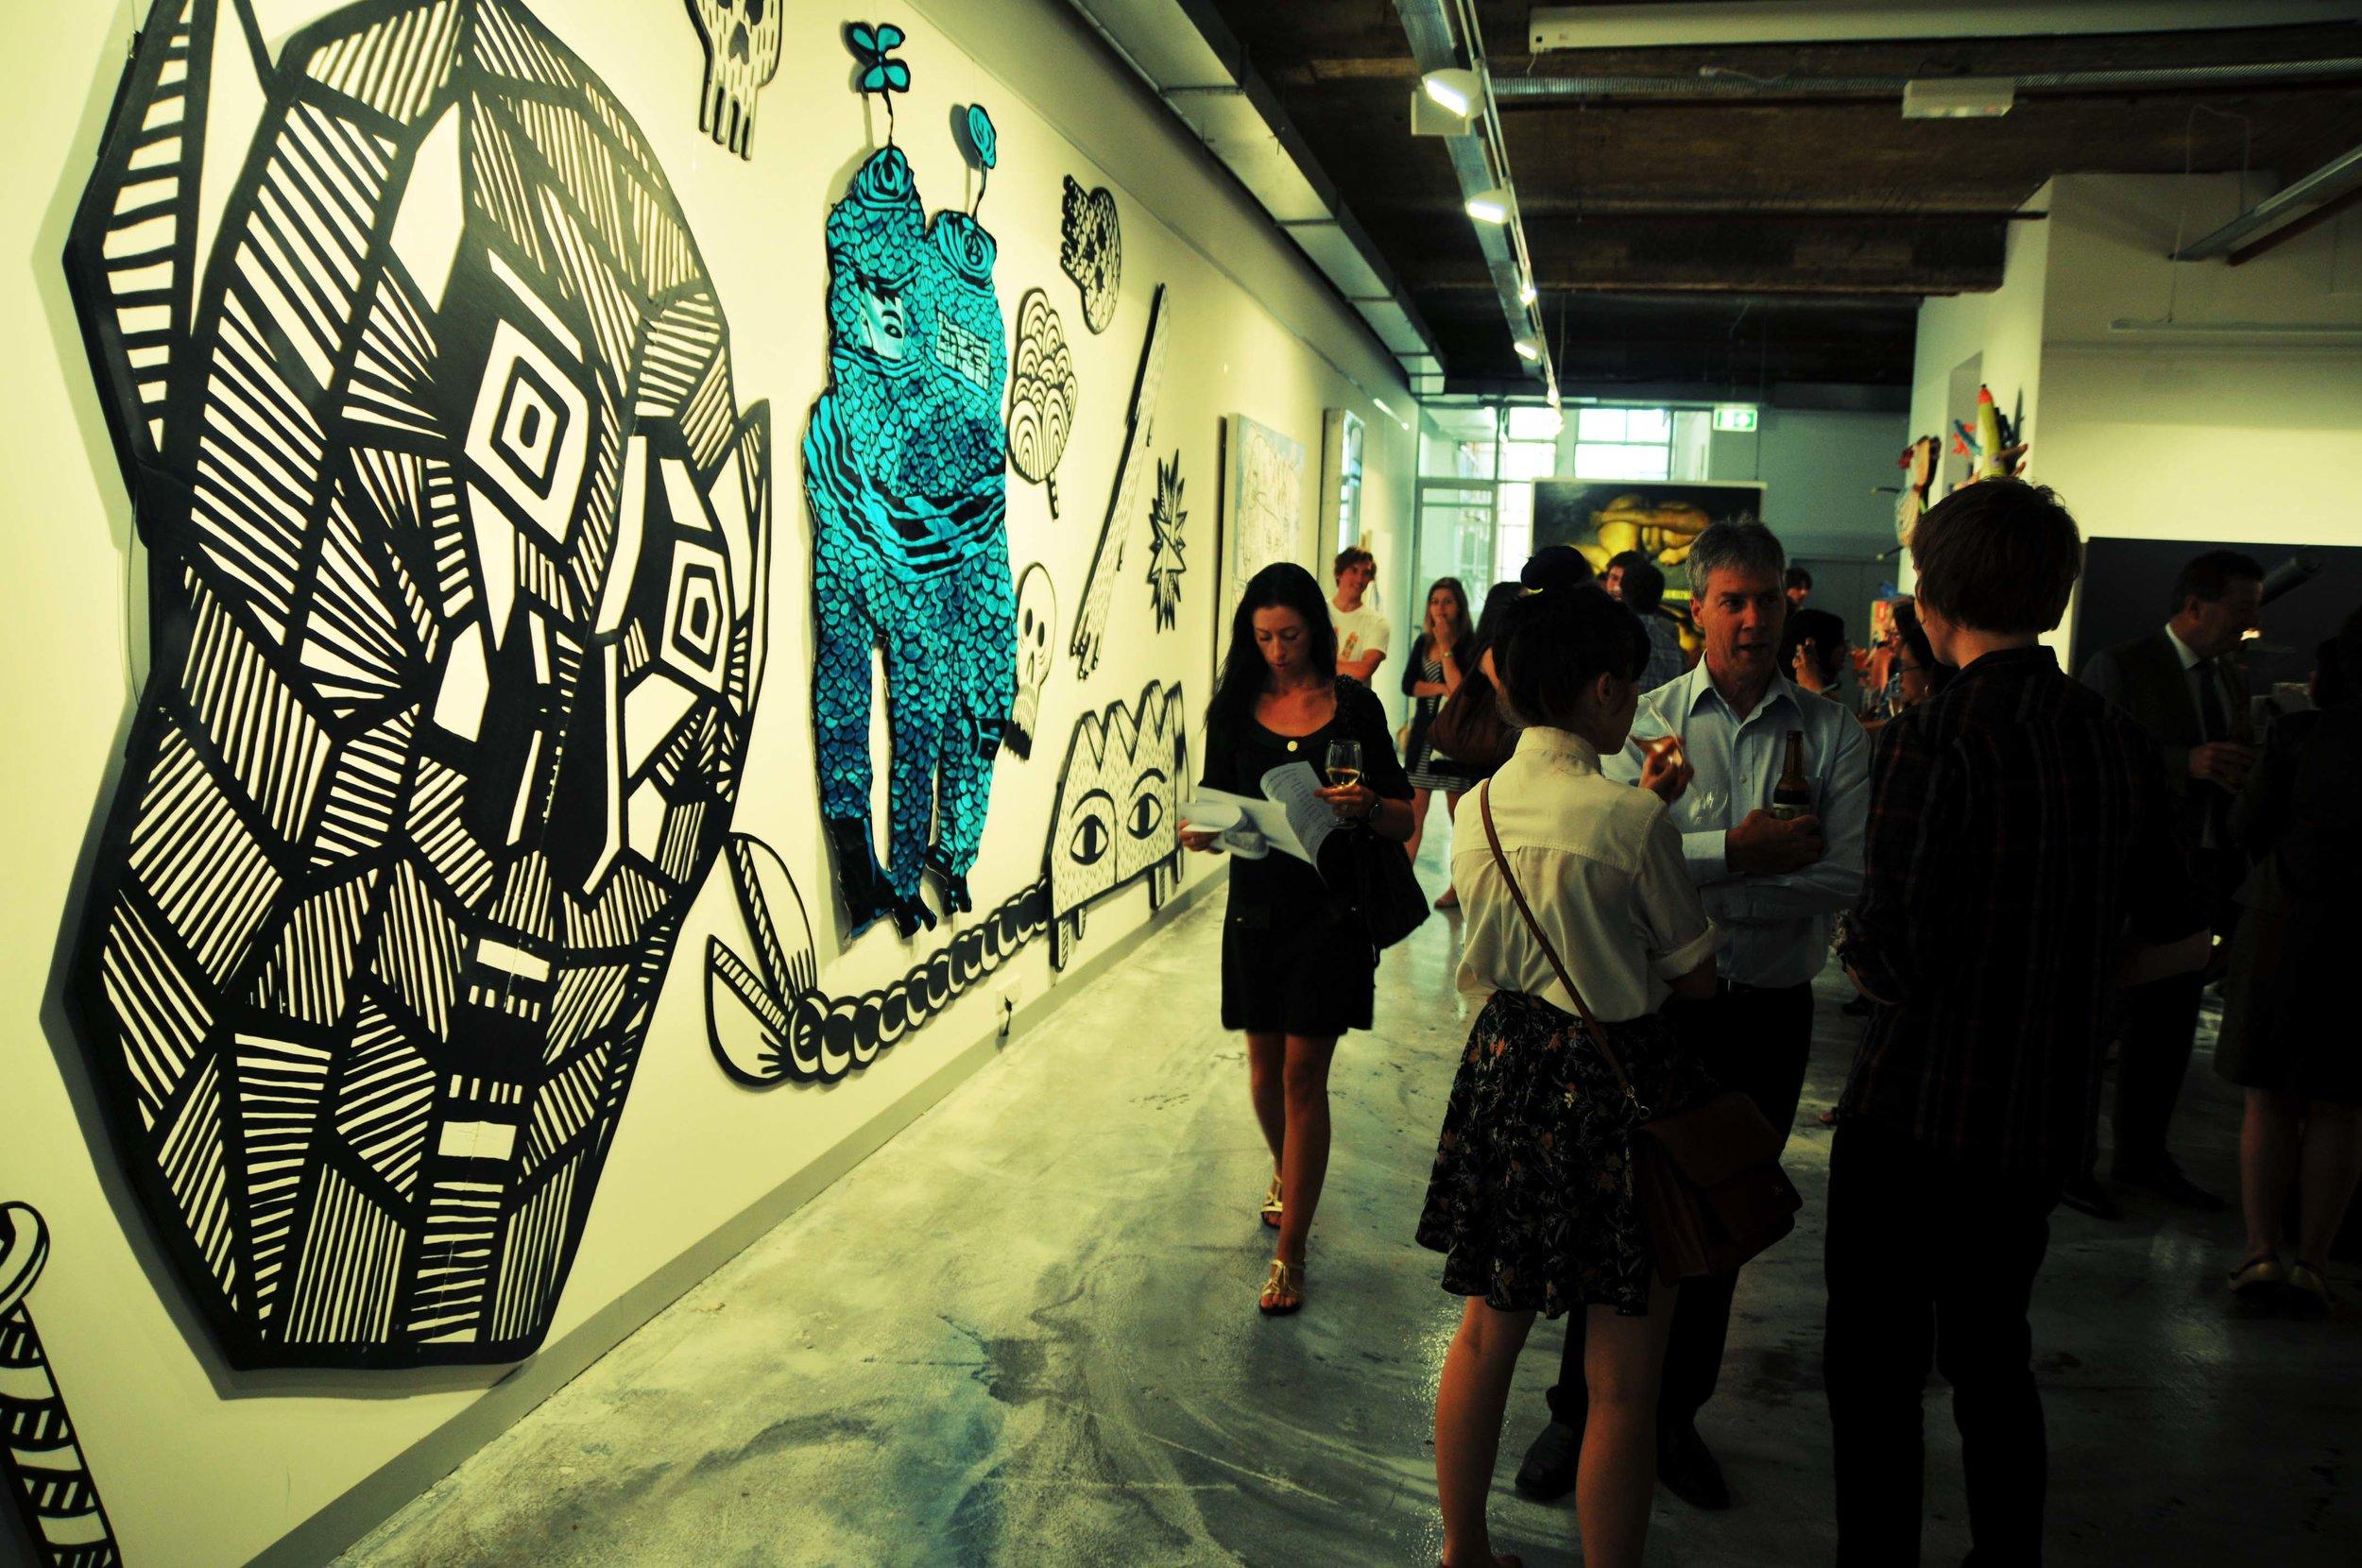 5_Closing the Gap, MiFA Gallery, Melbourne, 2011.JPG